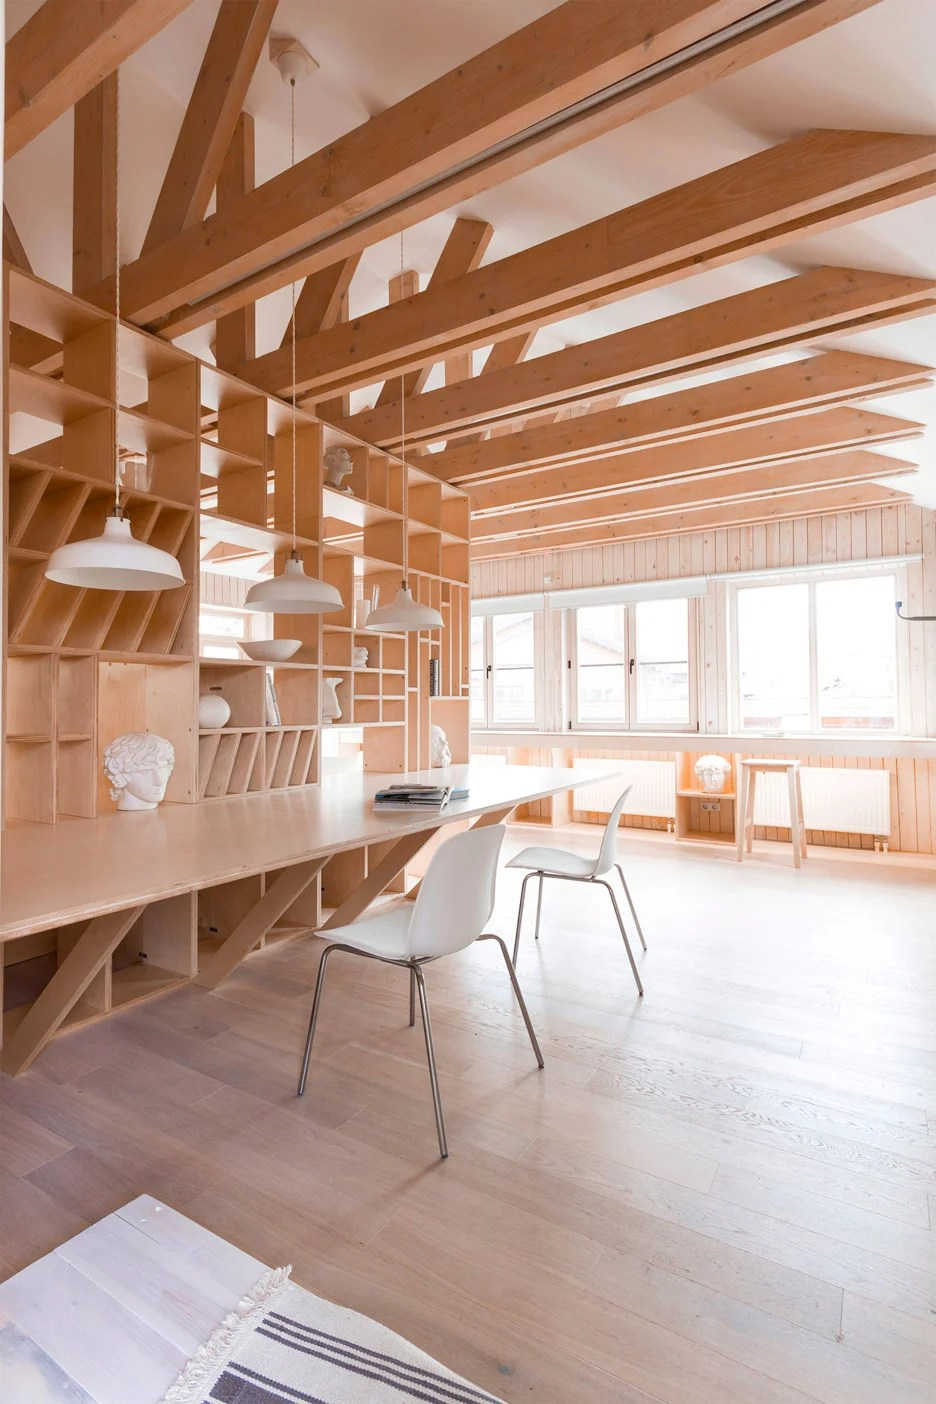 Artists studio by Ruetemple is designed in a single